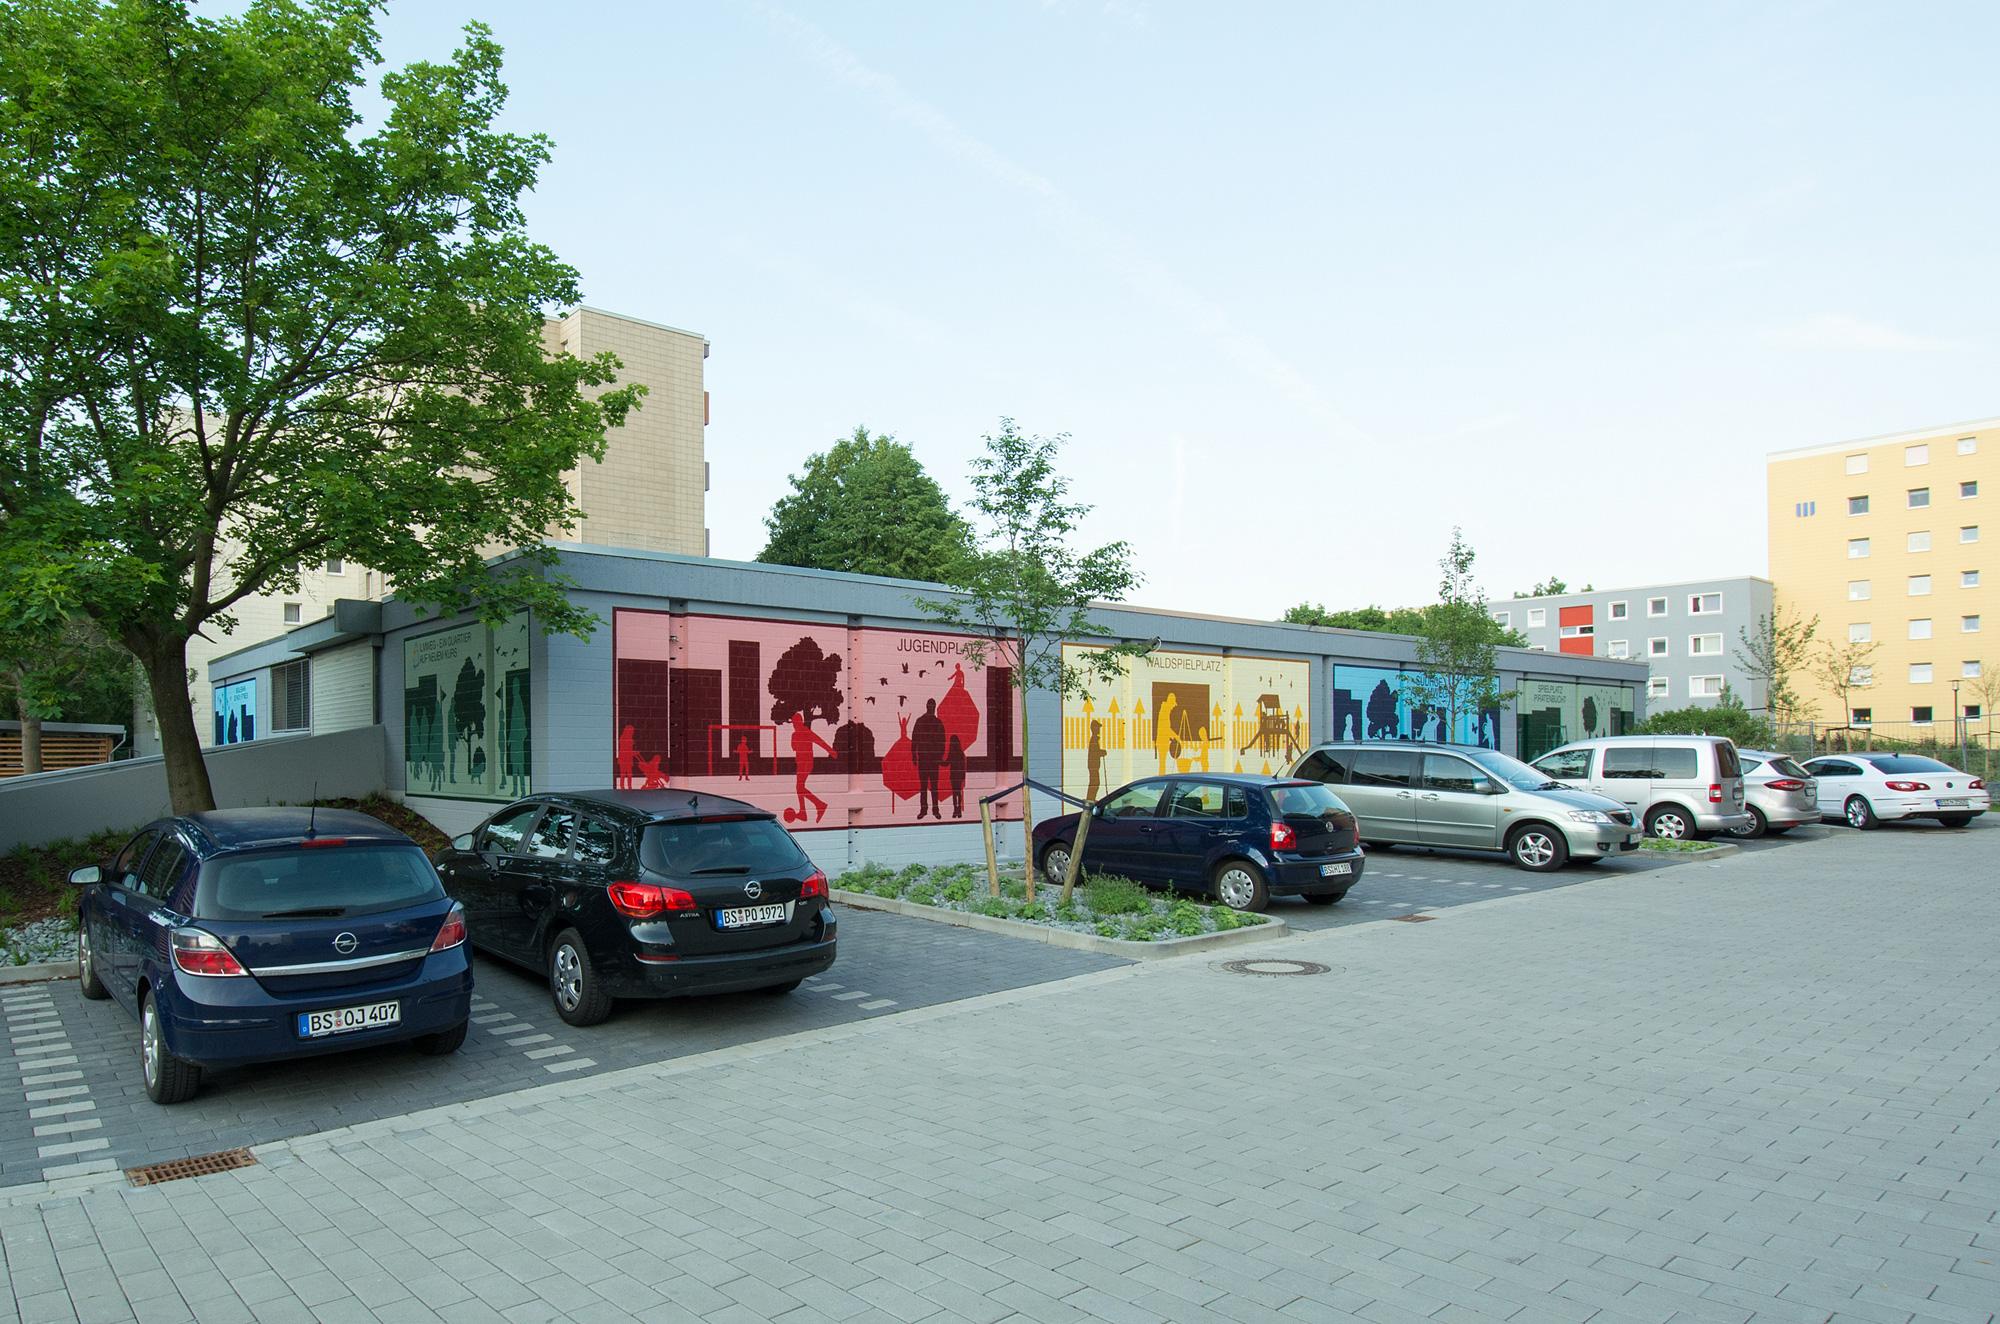 Graffiti-Fassadengestaltung-Kunst-am-Bau_01